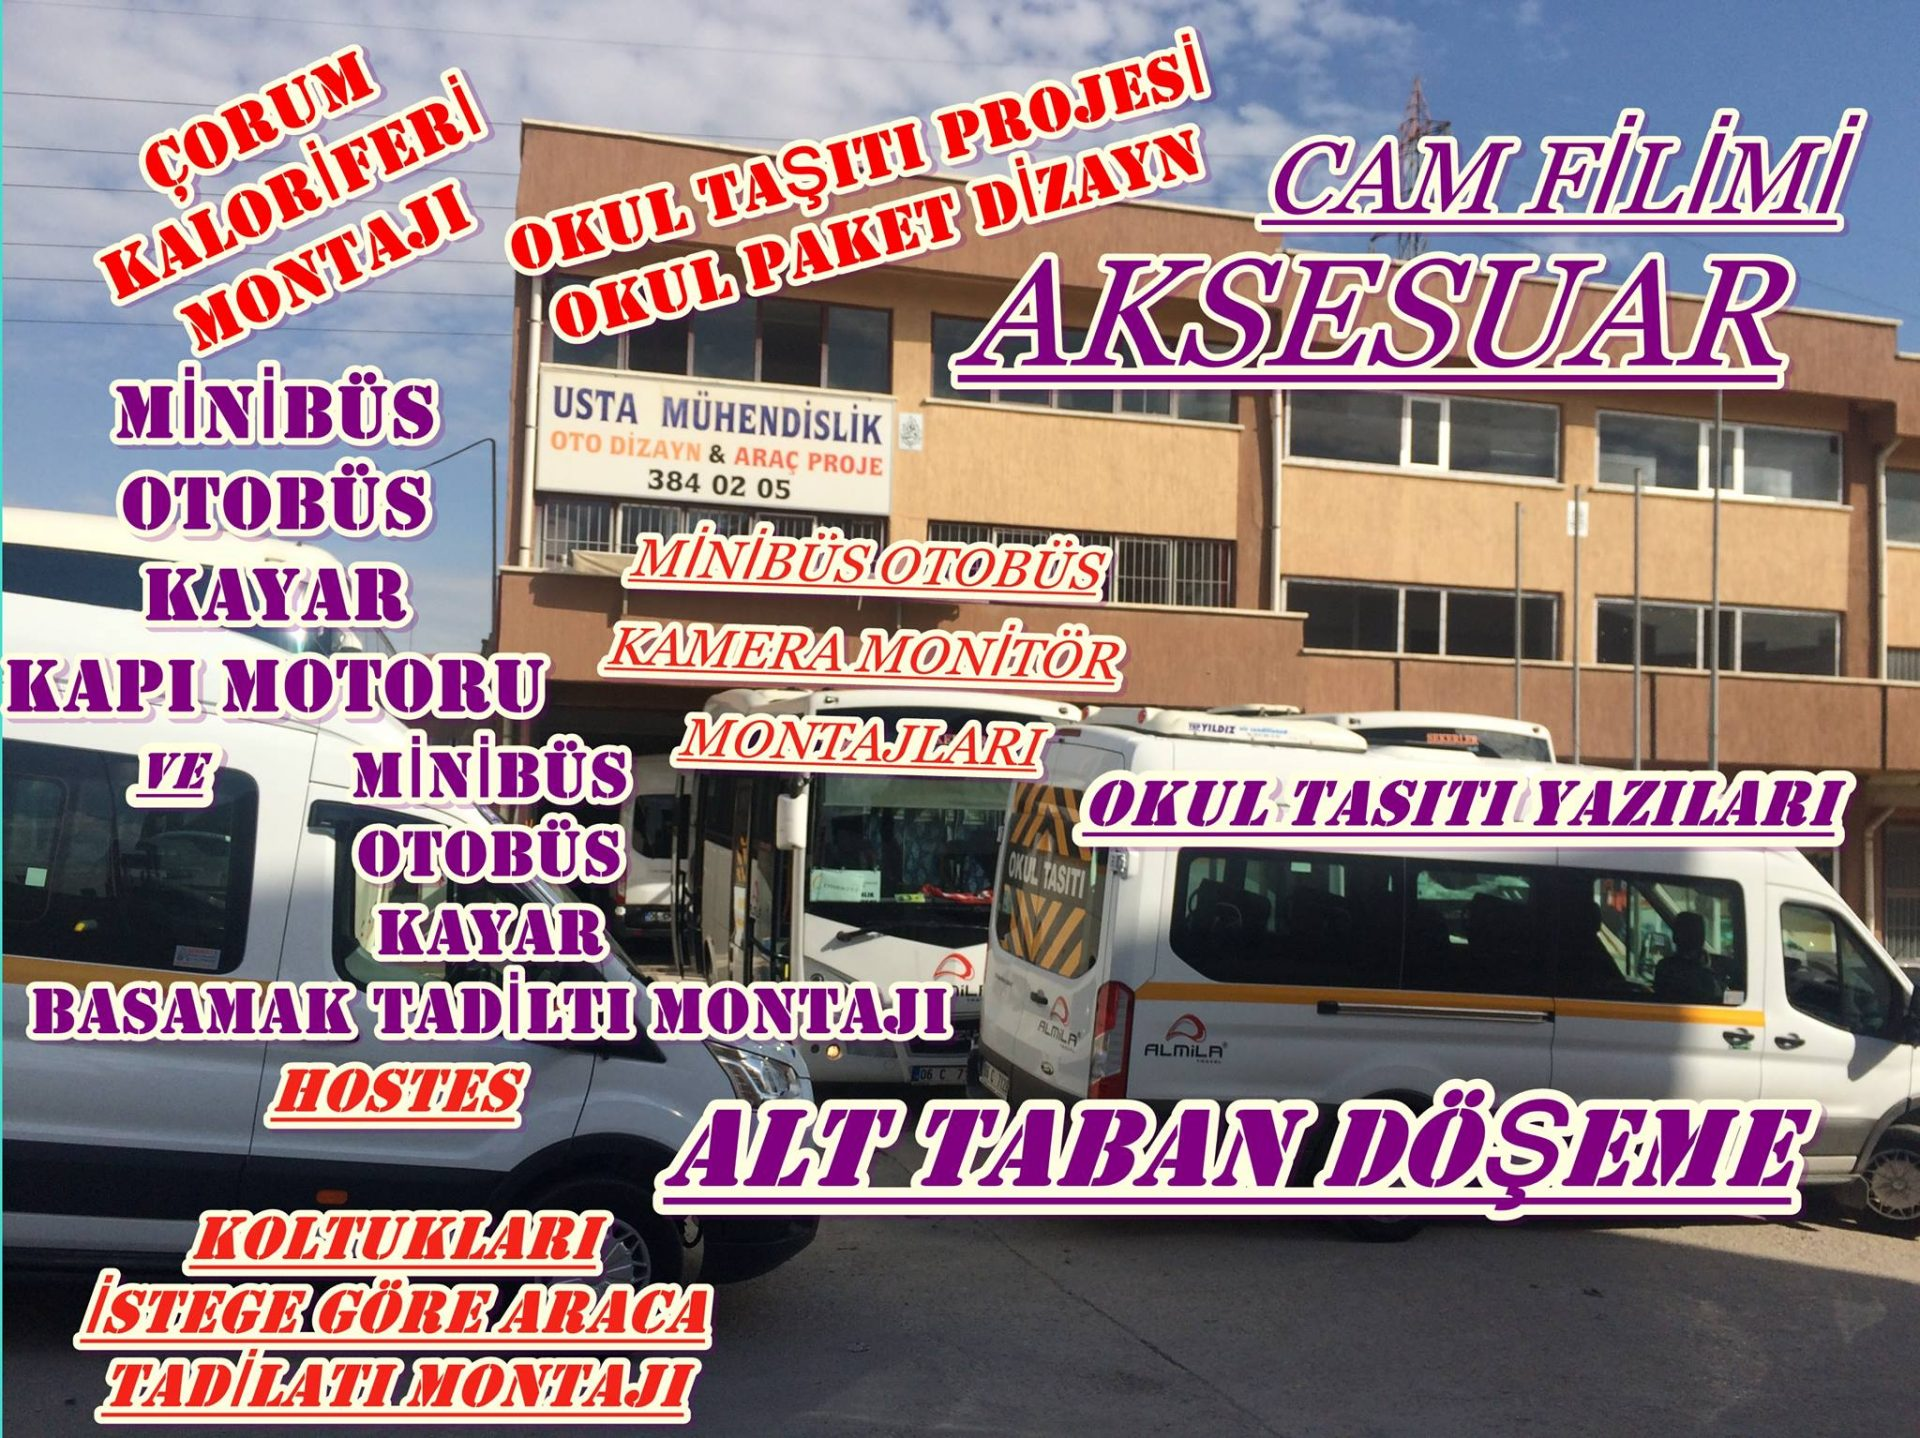 Usta Oto Dizayn Ankara